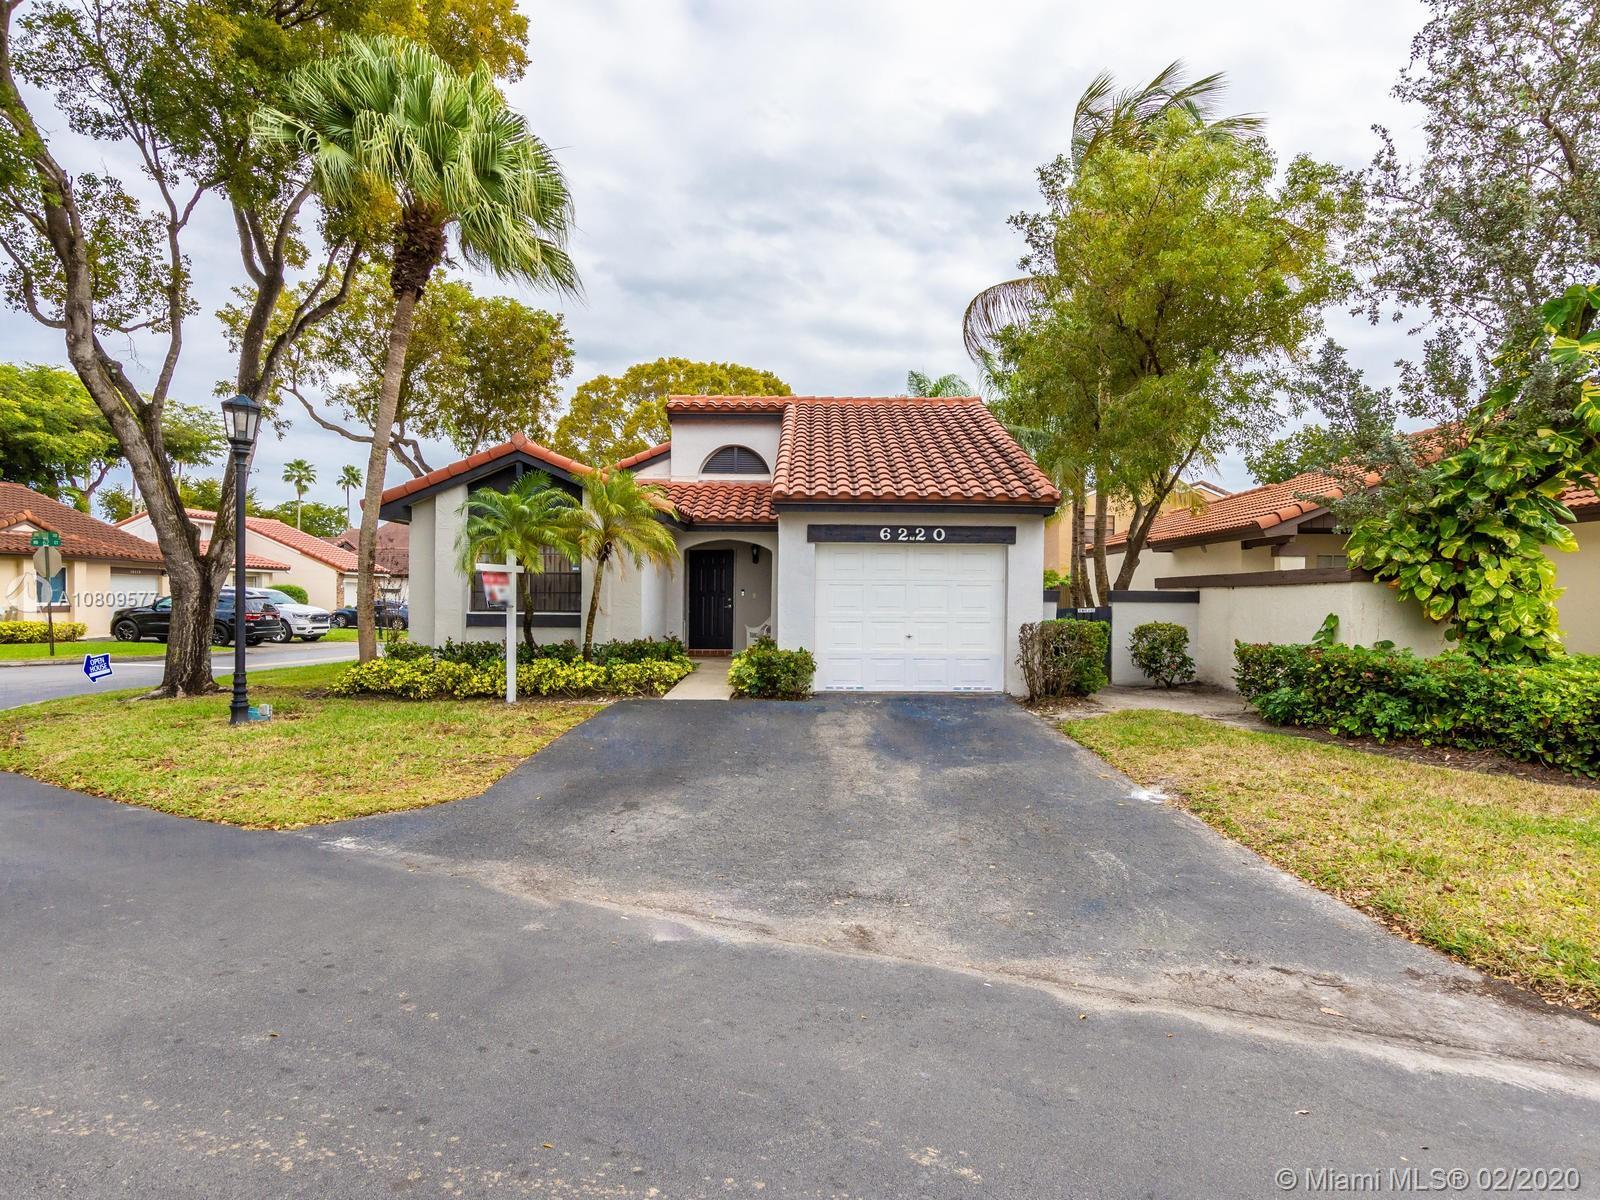 6220 NW 181st Ter, Hialeah, FL 33015 - Hialeah, FL real estate listing